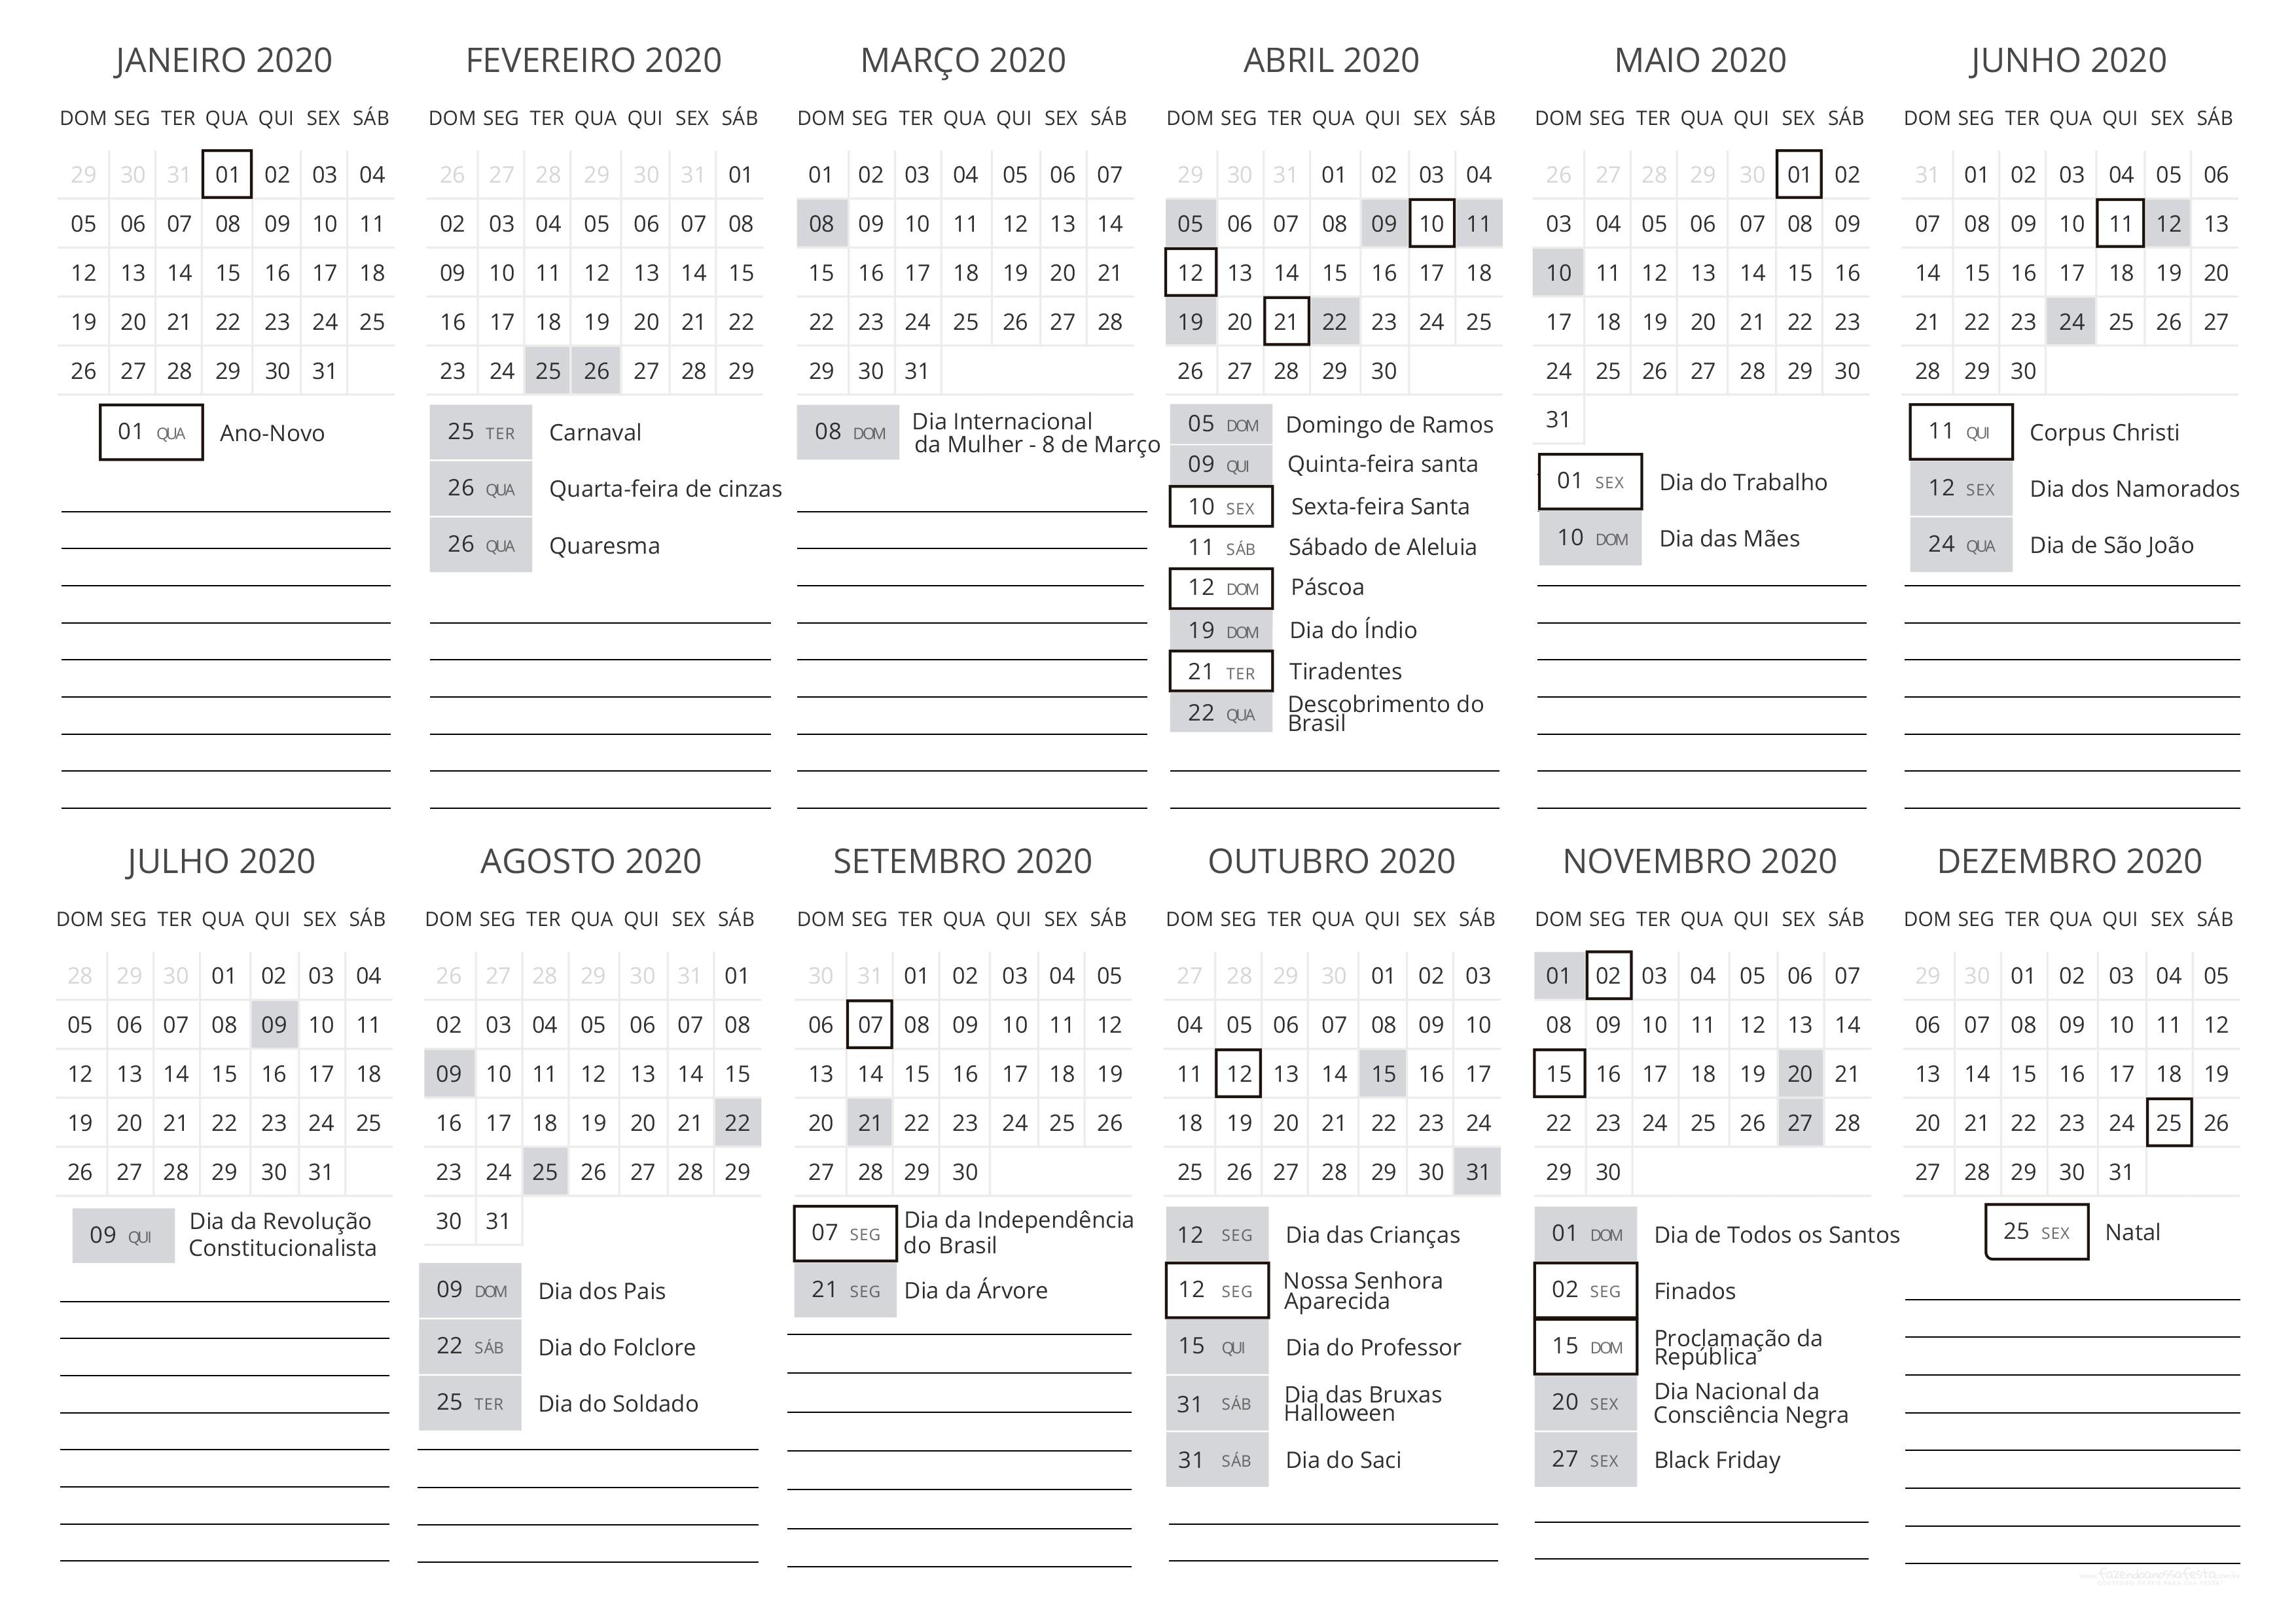 Calendario Escolar 2020 Xunta De Galicia Actual Calendario 2020 Feriados Para Impressao Of Calendario Escolar 2020 Xunta De Galicia Más Arriba-a-fecha Calaméo Carreteras Nºm 167 Carreteras Y Cambio Climático